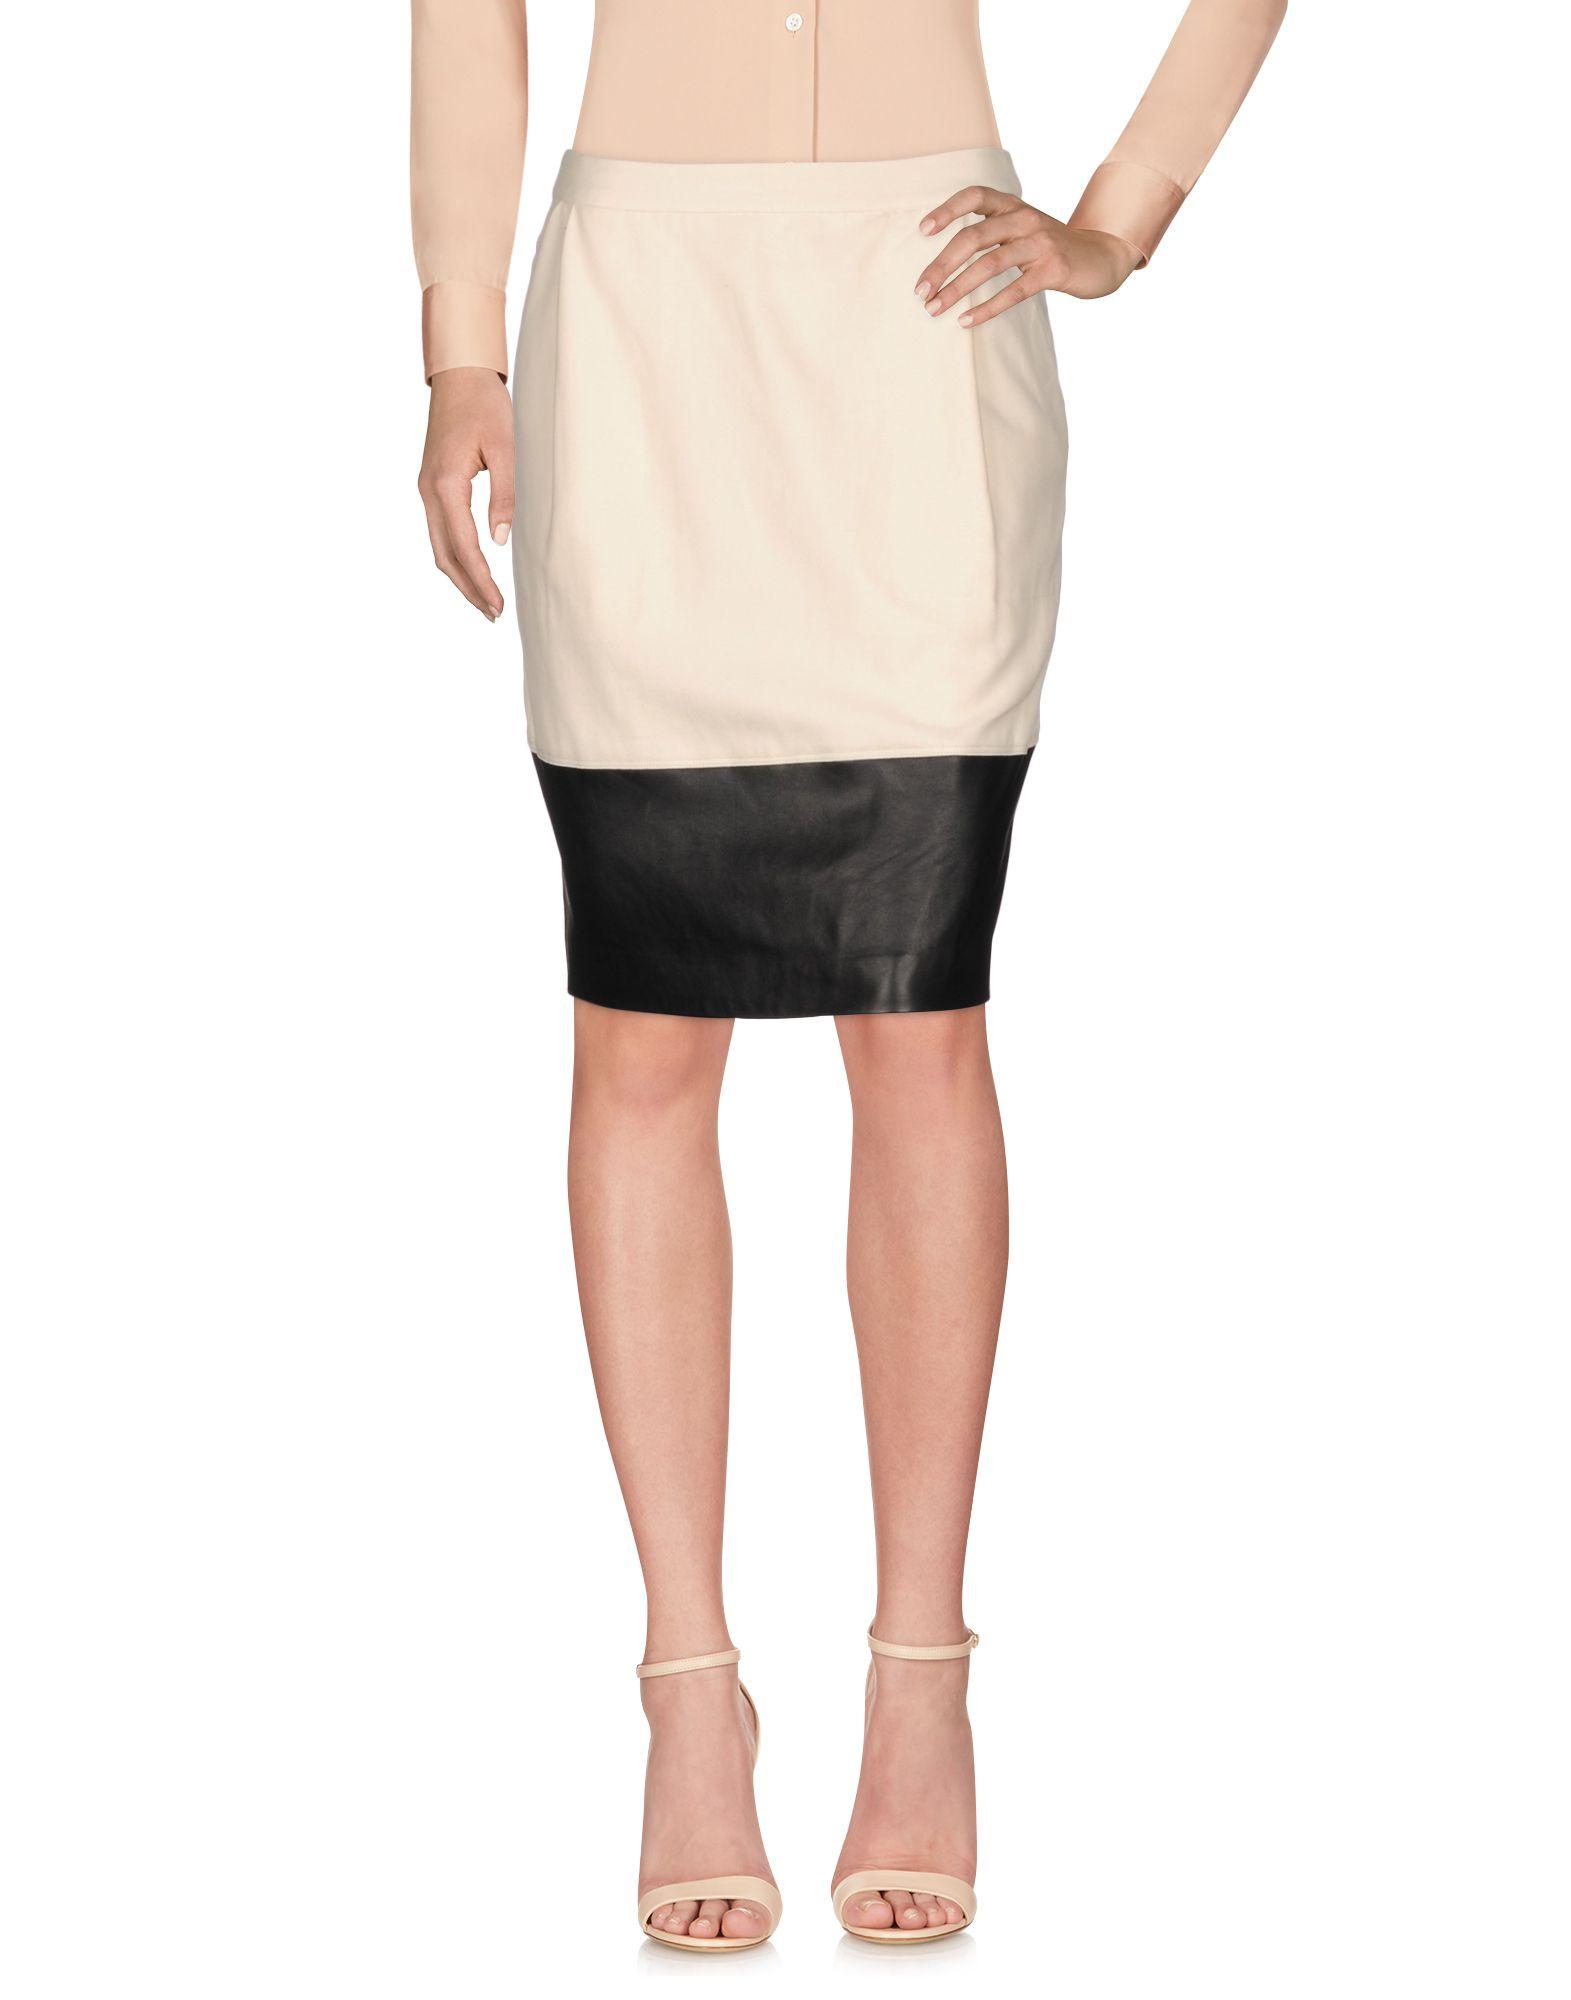 BAND OF OUTSIDERS Knee Length Skirt in Ivory